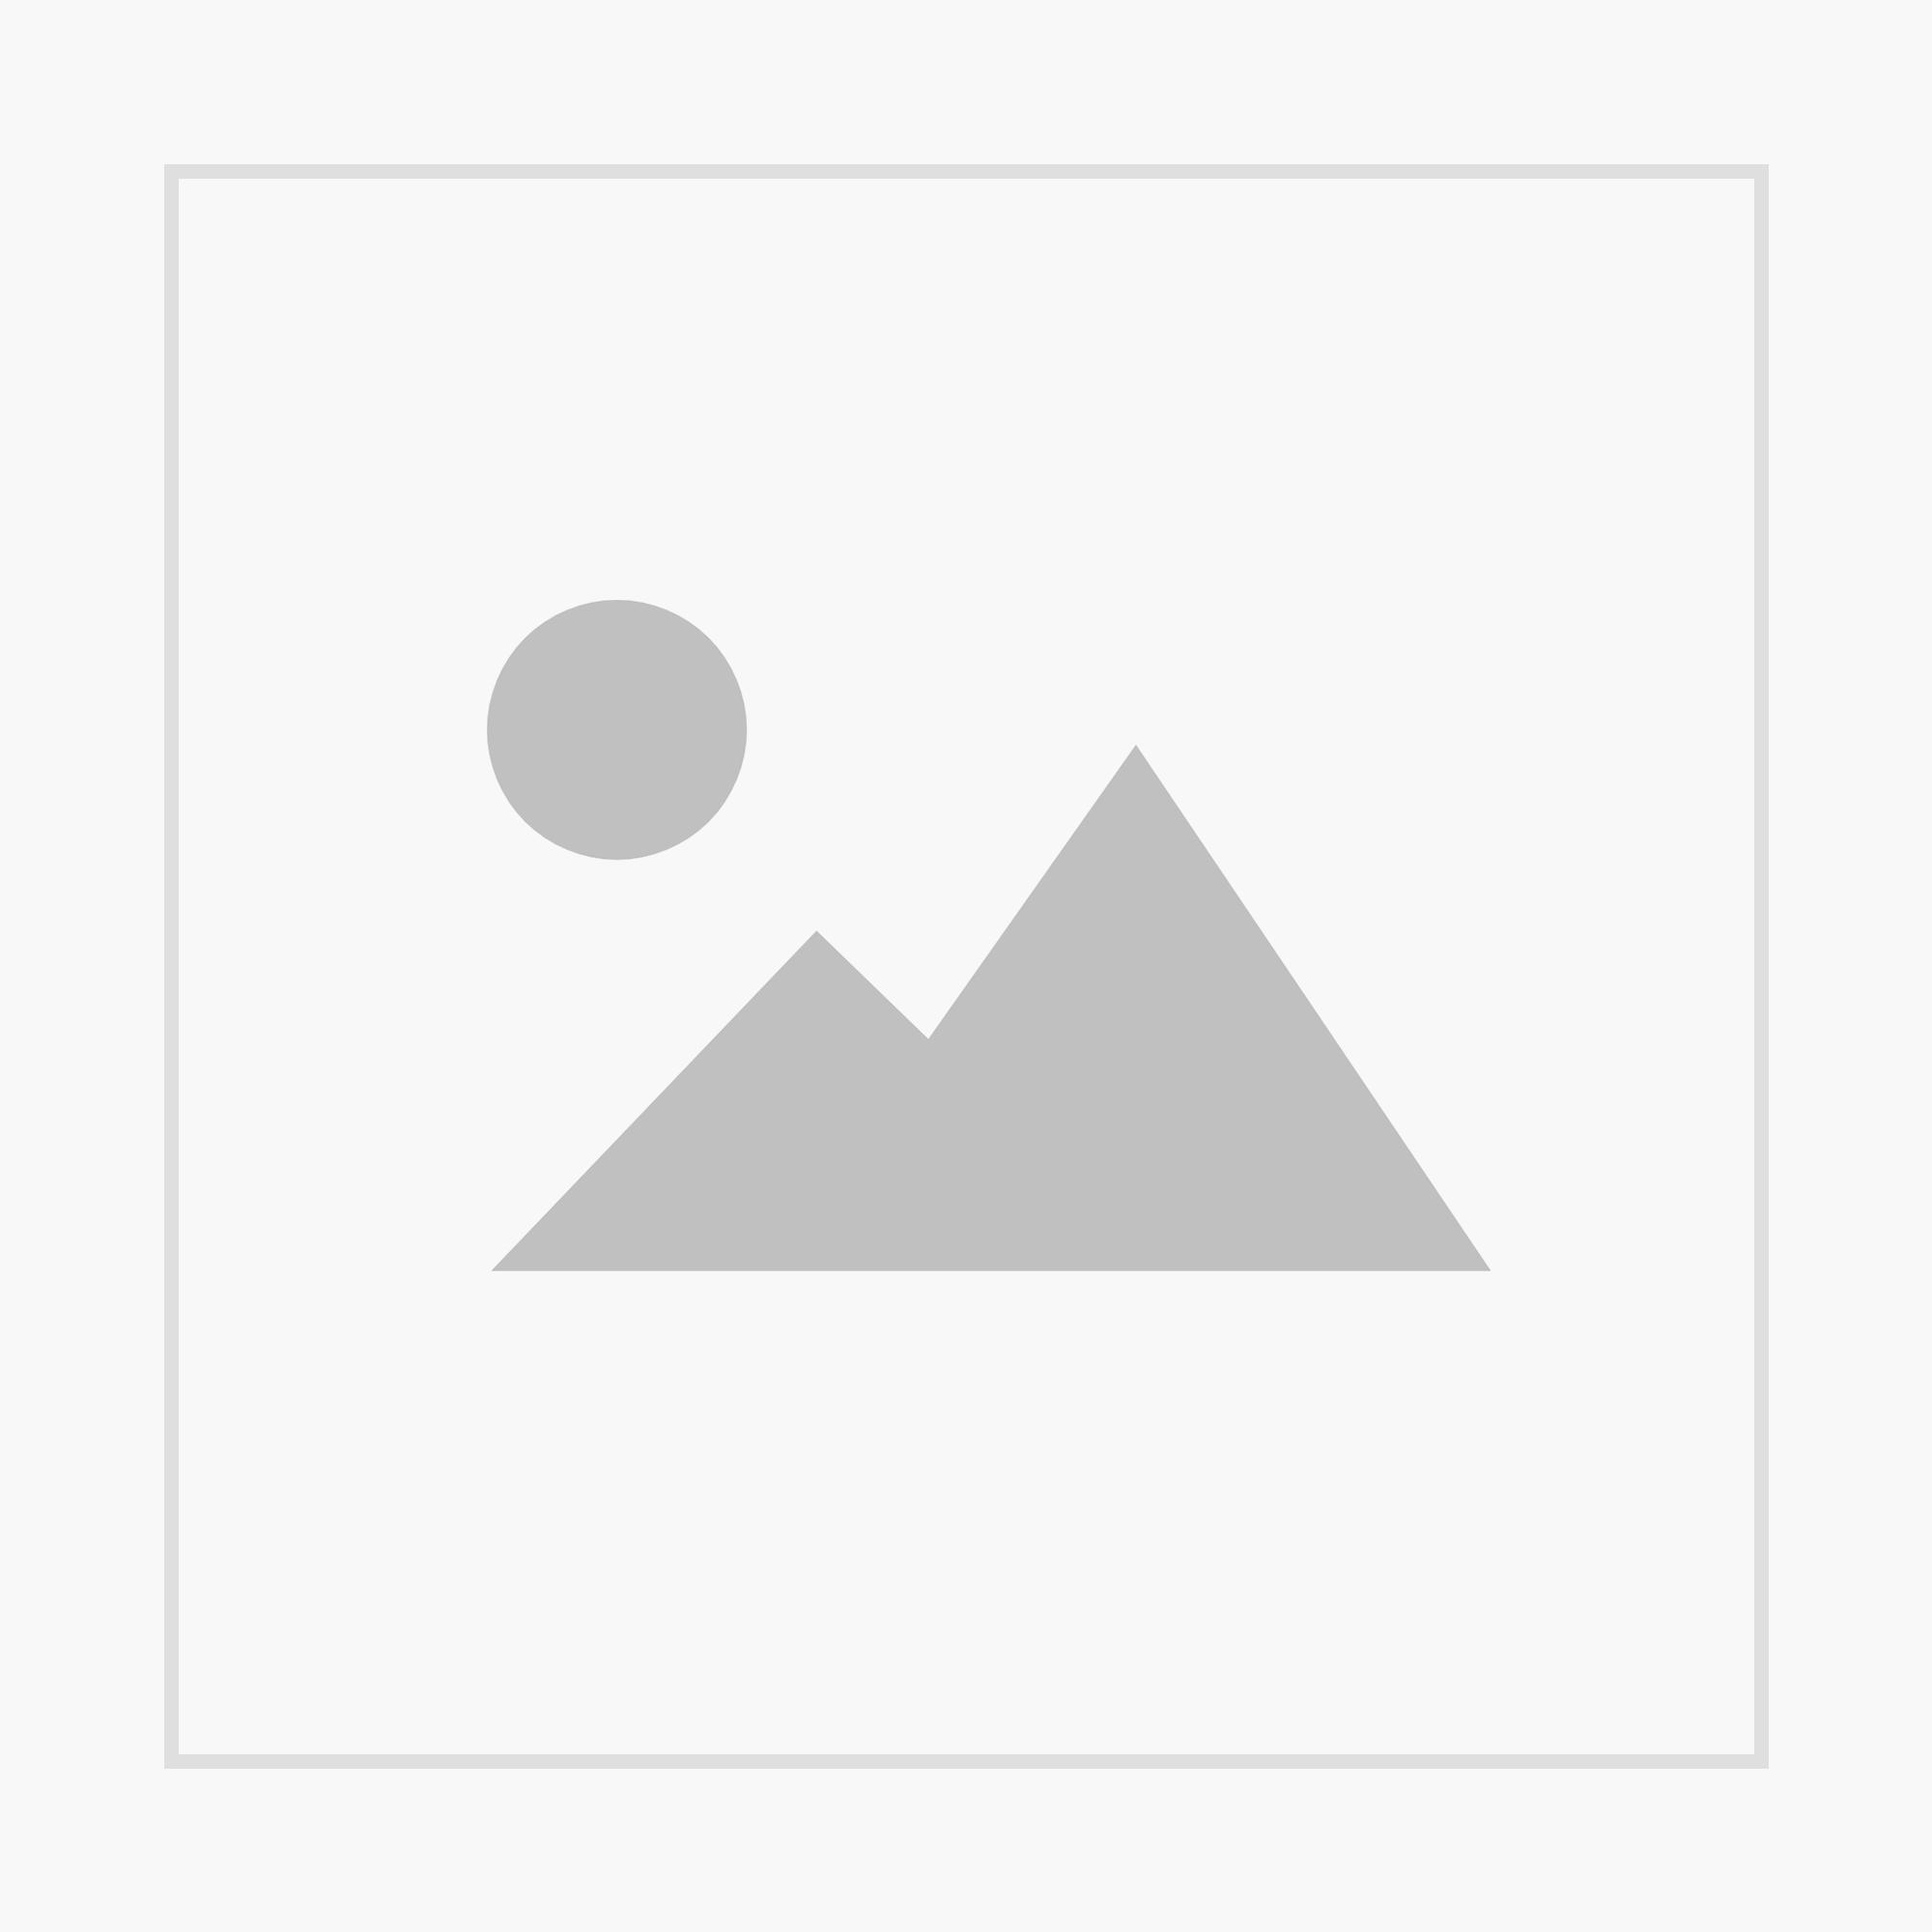 Land & Berge 6/2019